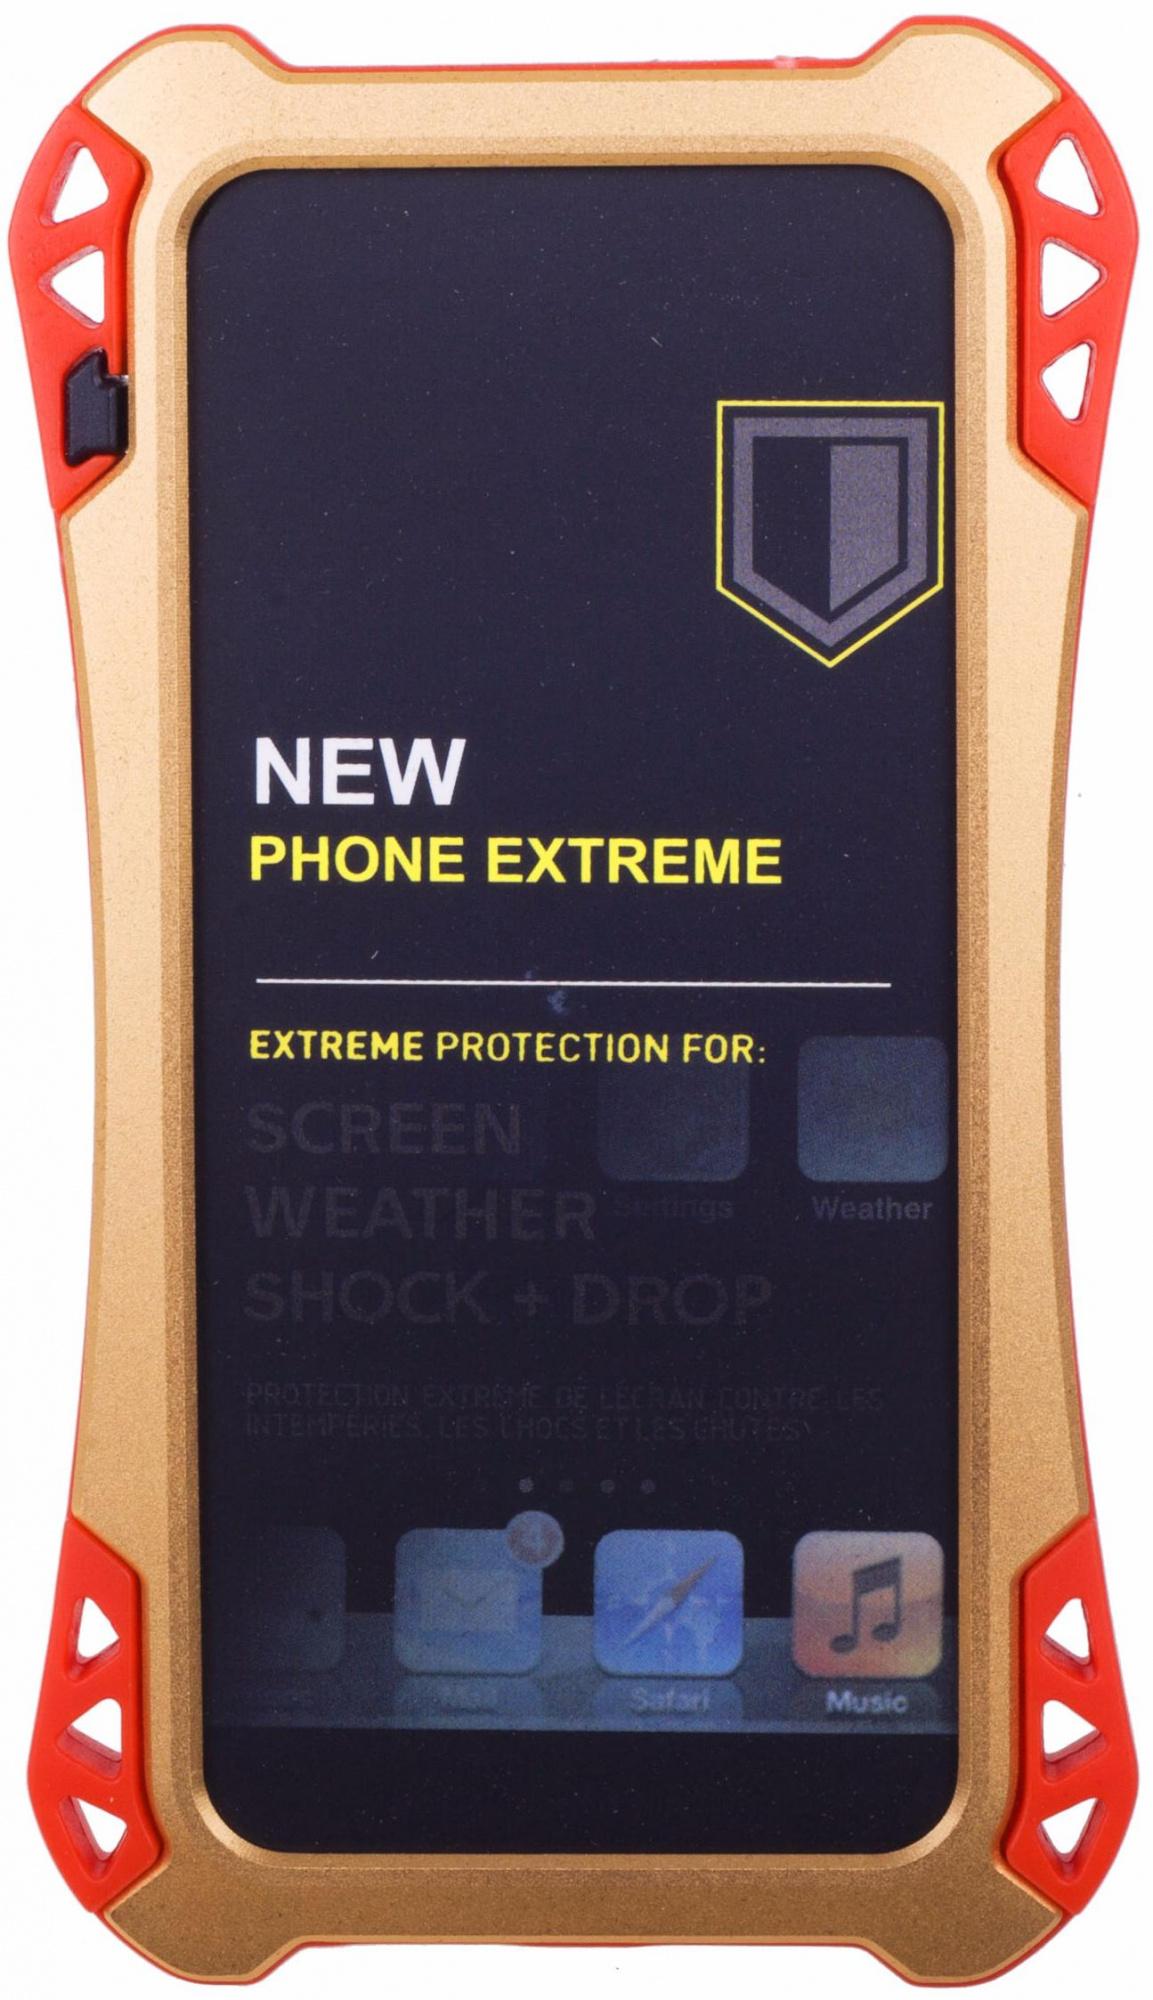 Amira Phone Extreme - защитный чехол для iPhone 5/5S/SE (Gold/Red)